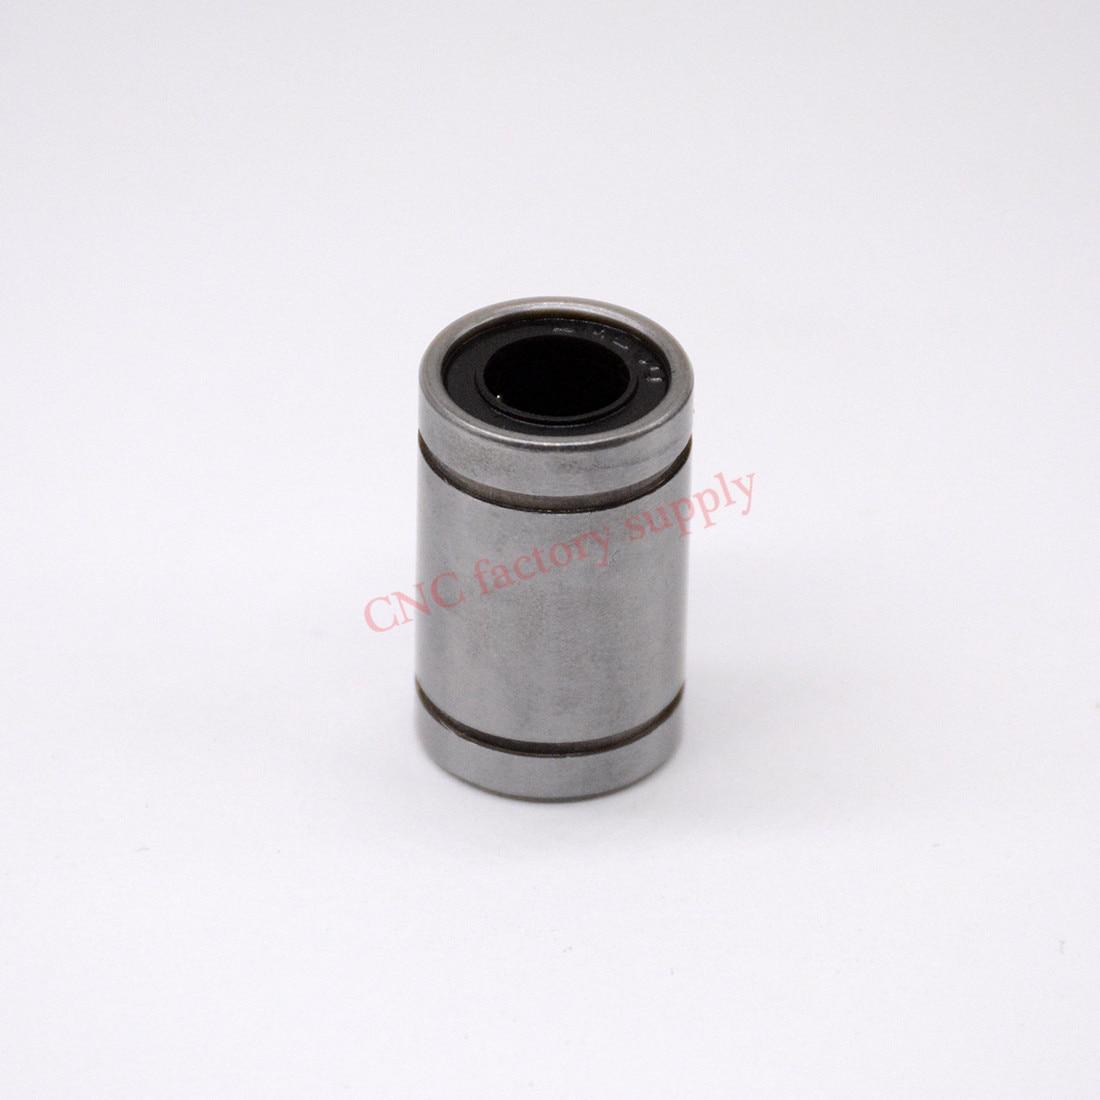 Hot sale  1pc LM12UU Linear Bushing  12mm CNC Linear Bearings hot sale 1pc lm12uu linear bushing 12mm cnc linear bearings